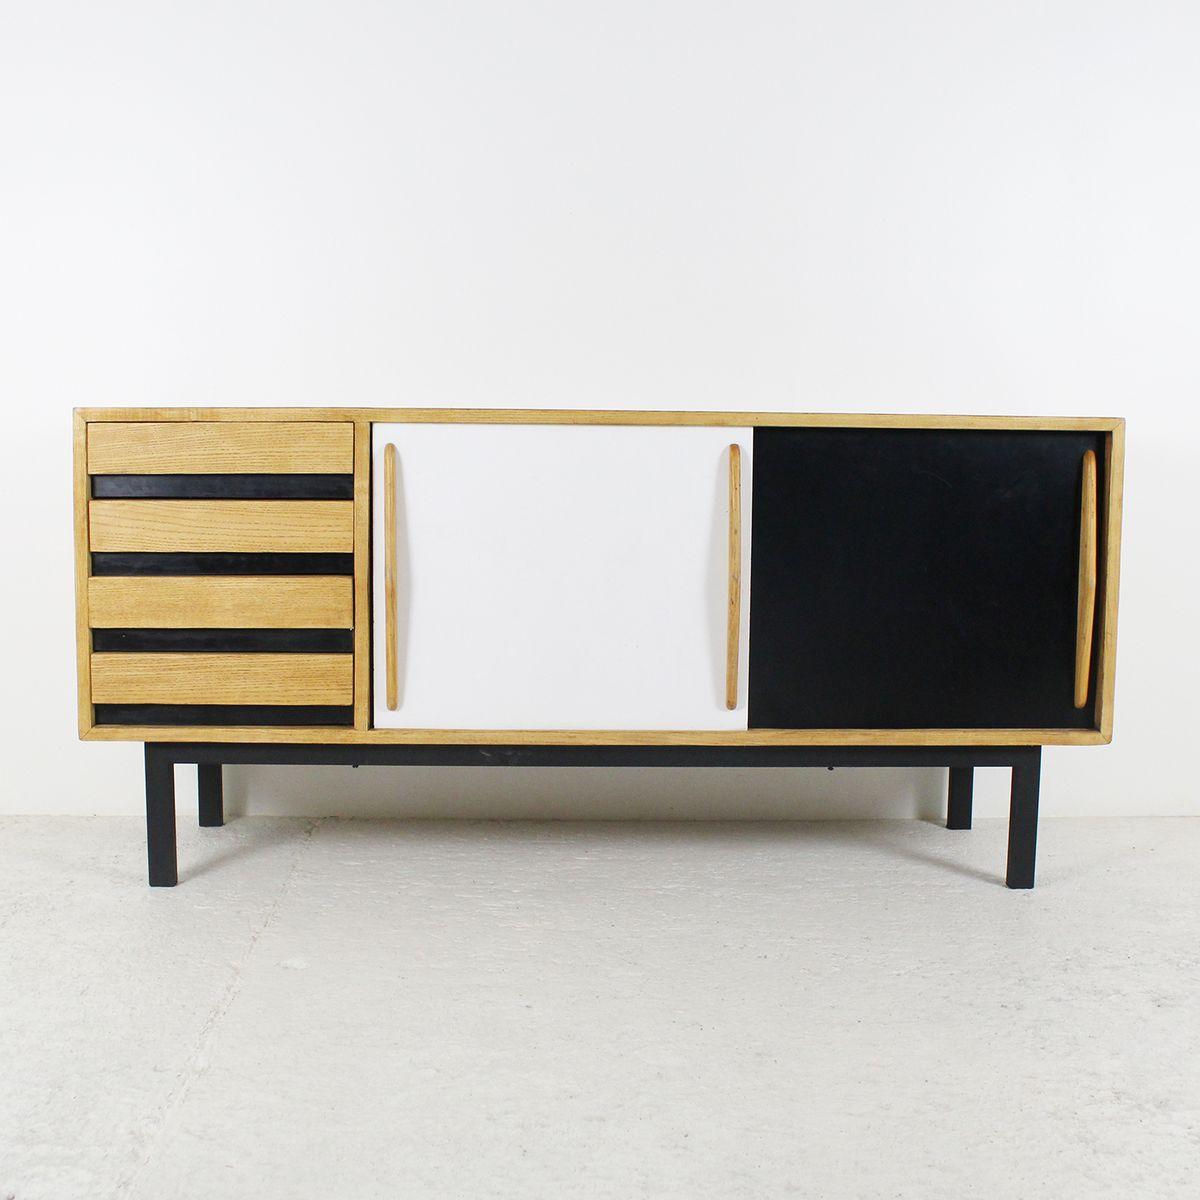 Cansado Sideboard von Charlotte Perriand für Steph Simon, 1958